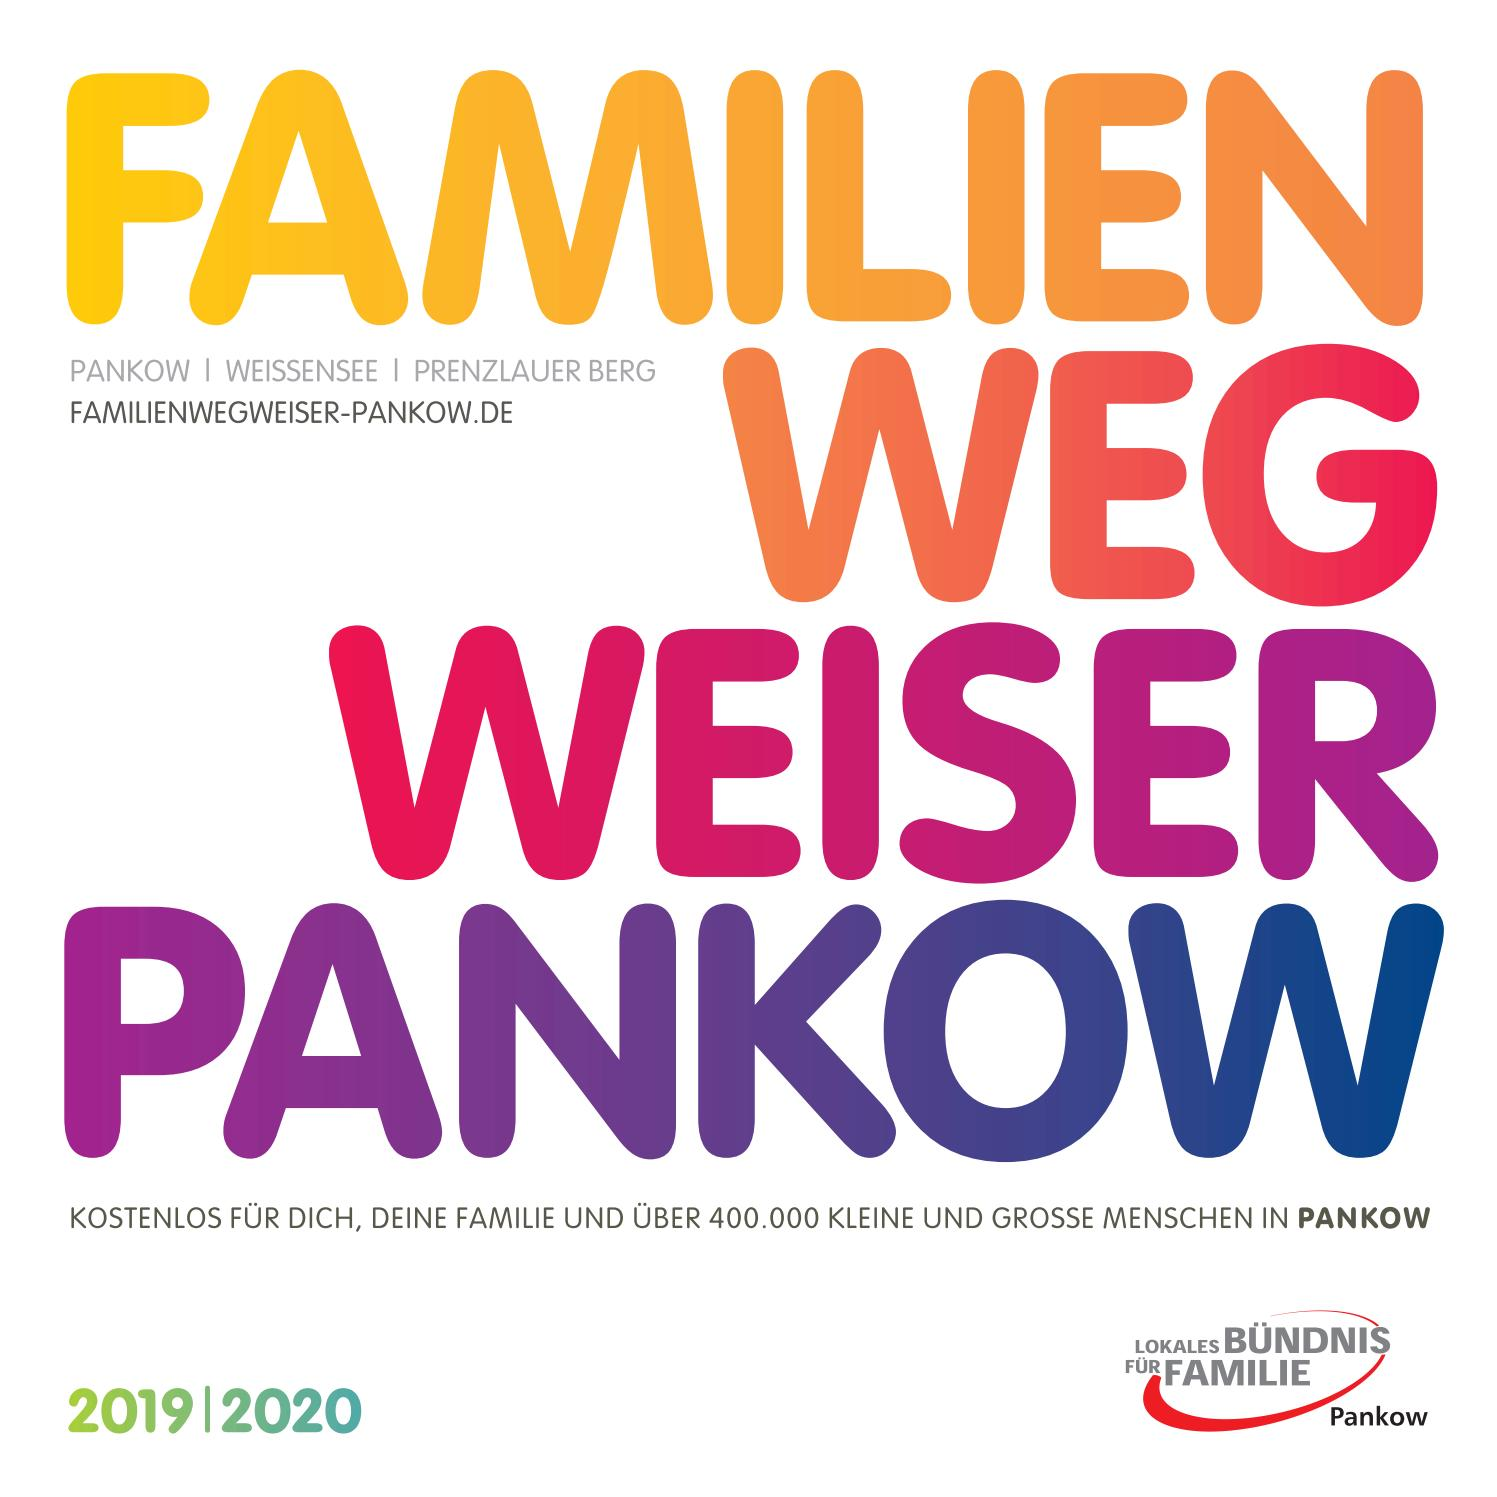 familienwegweiser pankow 2019 2020 by in touch berlin lokalmarketing issuu